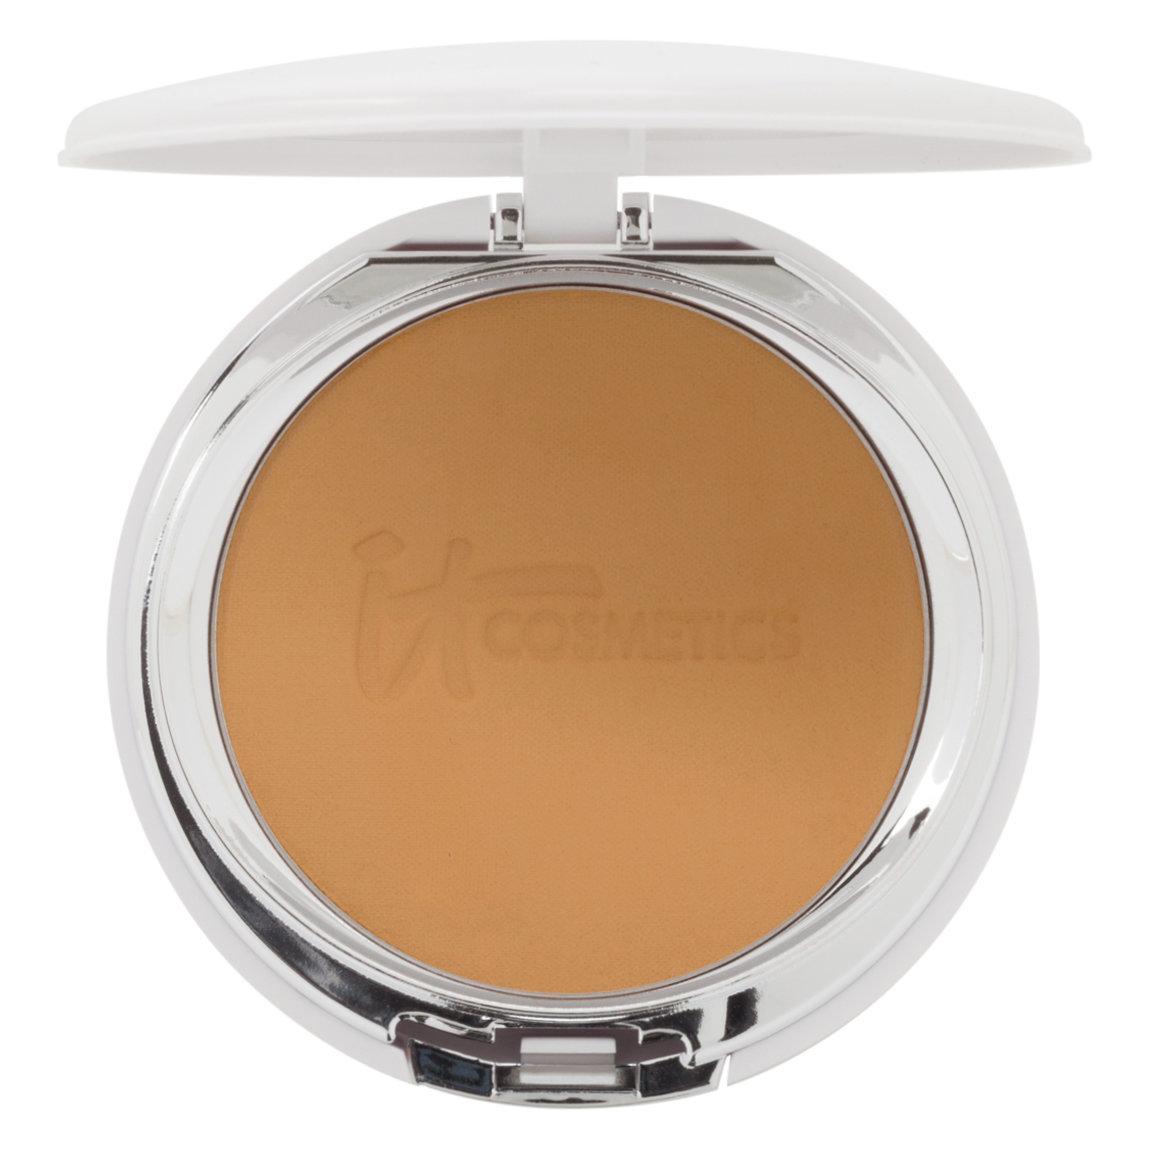 IT Cosmetics  Celebration Foundation Illumination Rich alternative view 1 - product swatch.